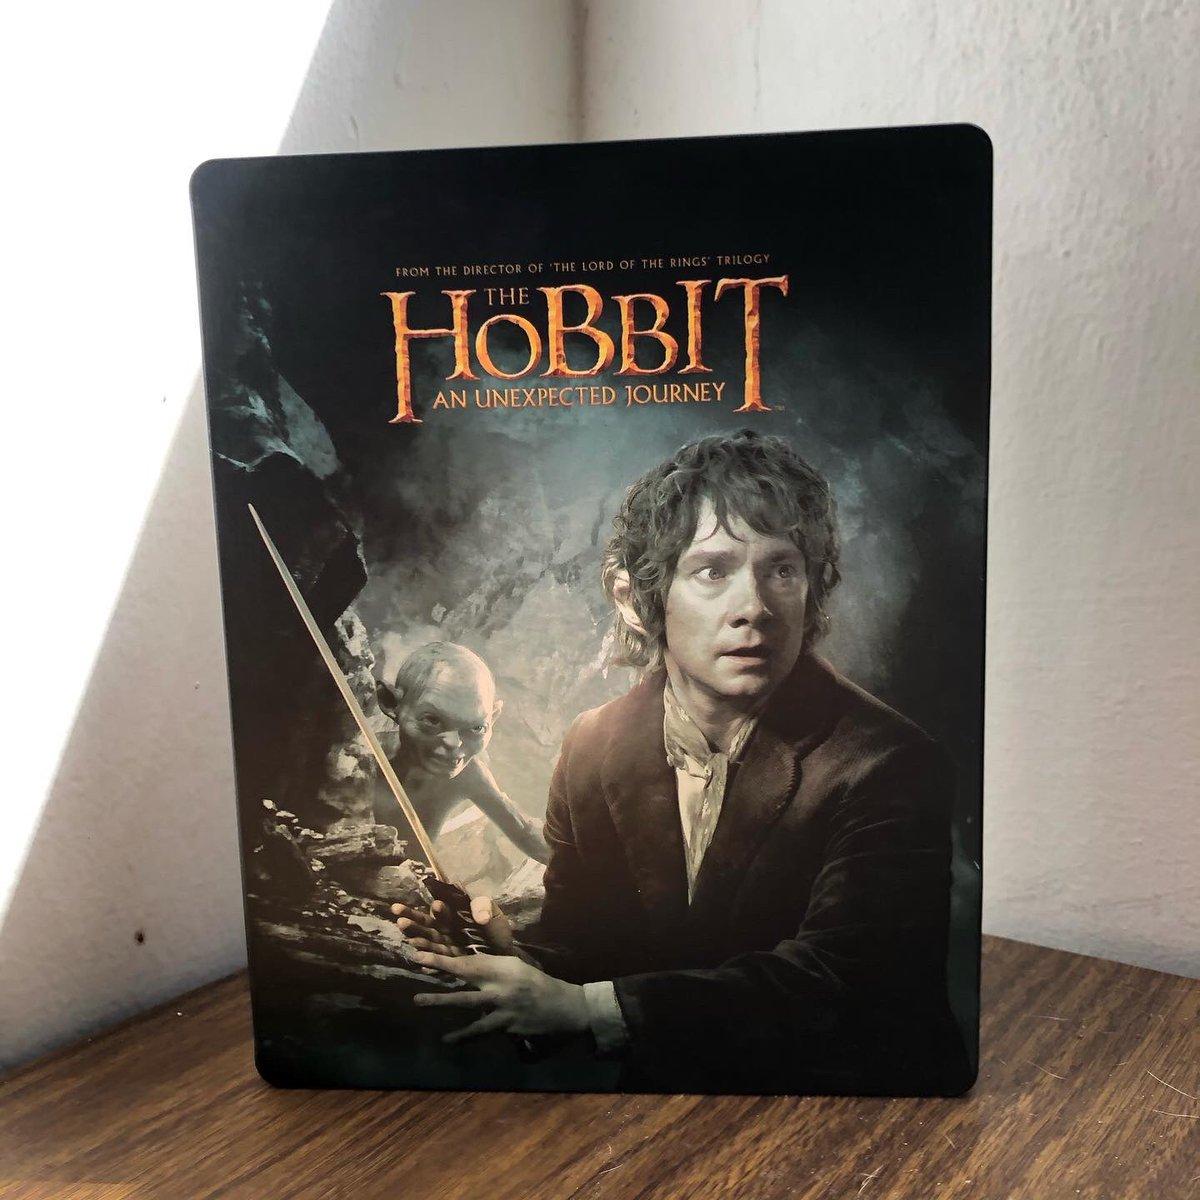 The Hobbit: An Unexpected Journey (2012) - Peter Jackson.  #GuillermoDelToro #JRRTolkien #IanMcKellen #CateBlanchett #Movie #Steelbook #EspecialEdition #TheLordOfTheRings #Bluray #BehindTheScenes https://t.co/hPz1EDbeh1